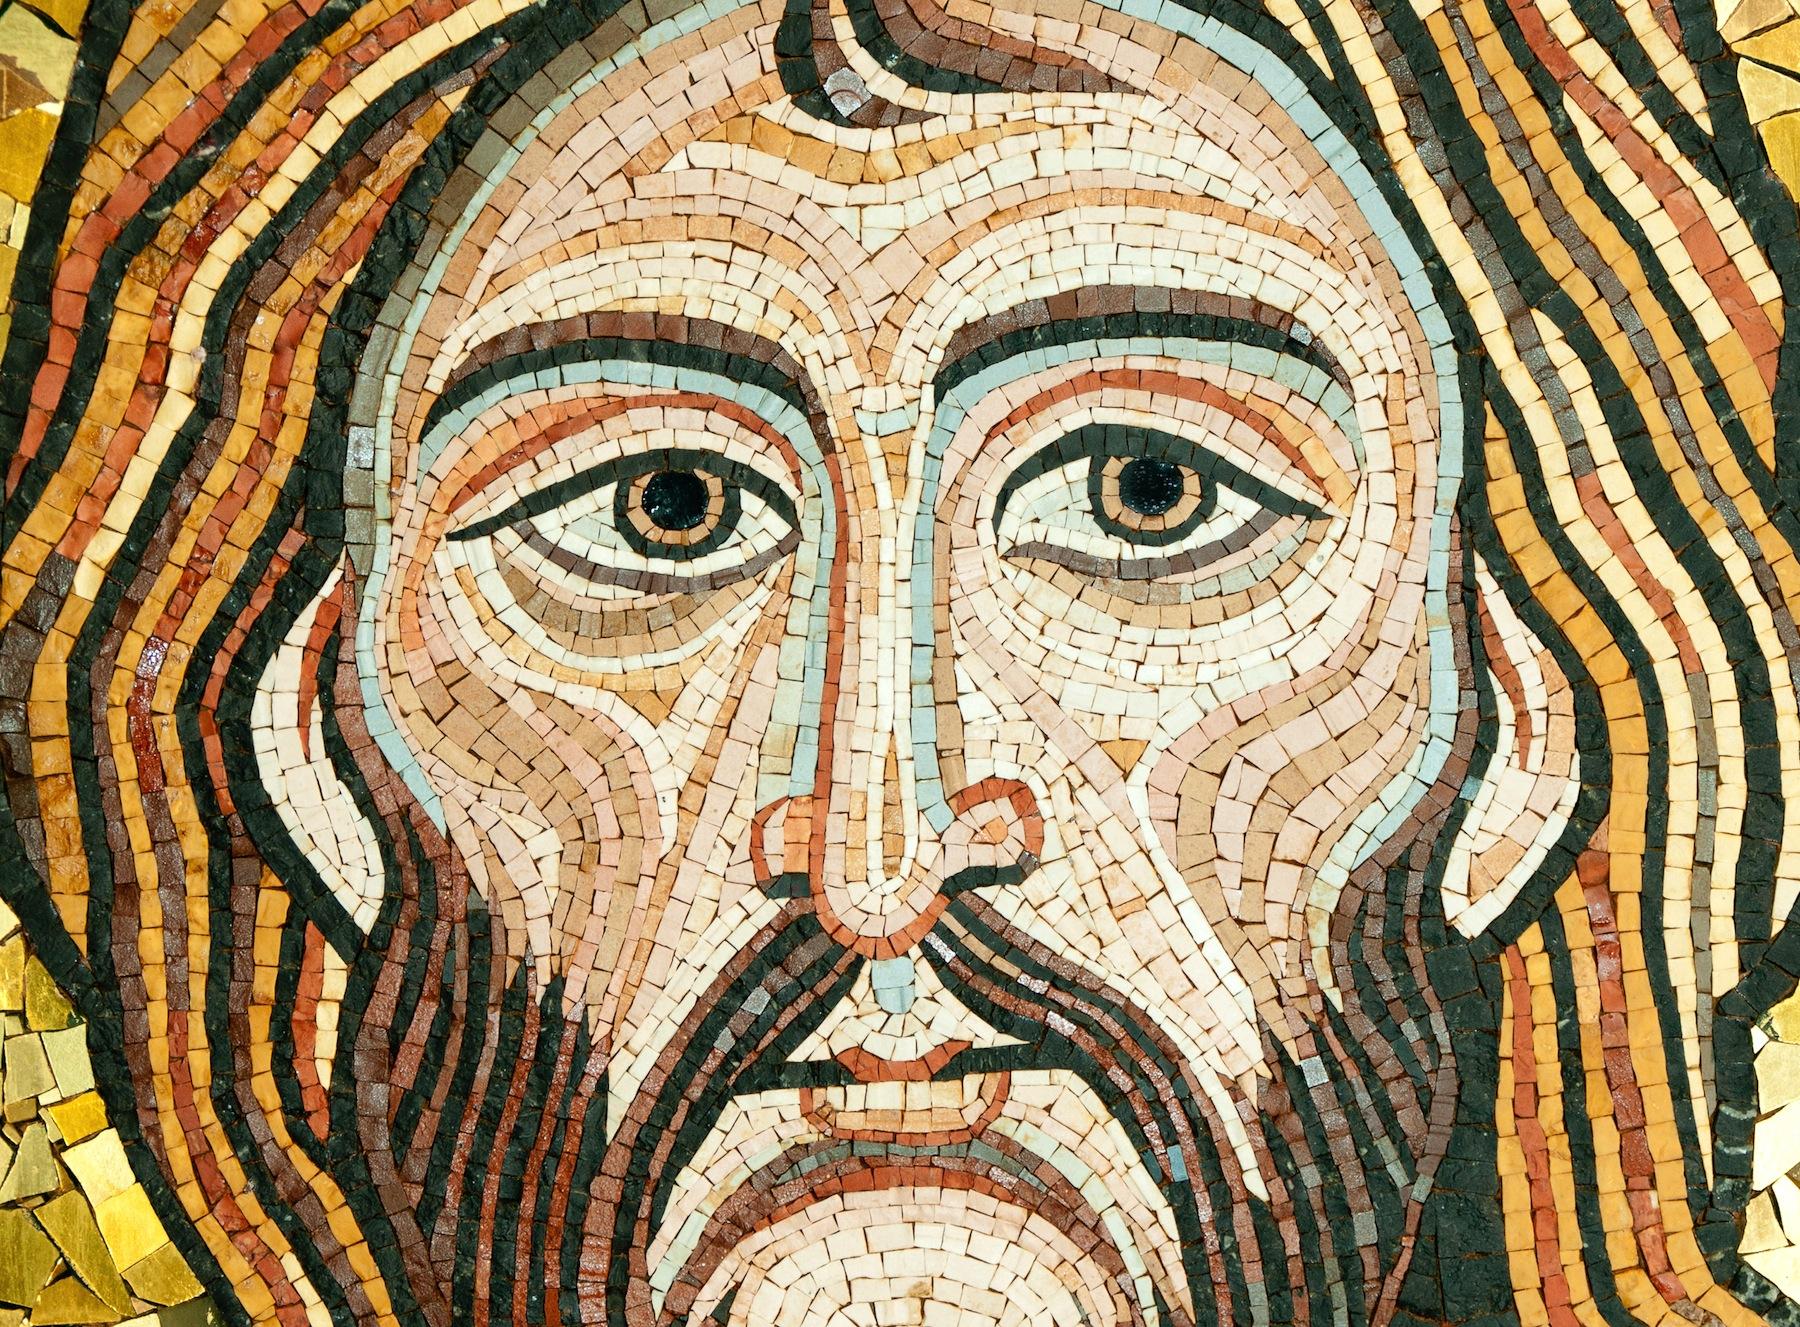 Jesus-easter-bunny